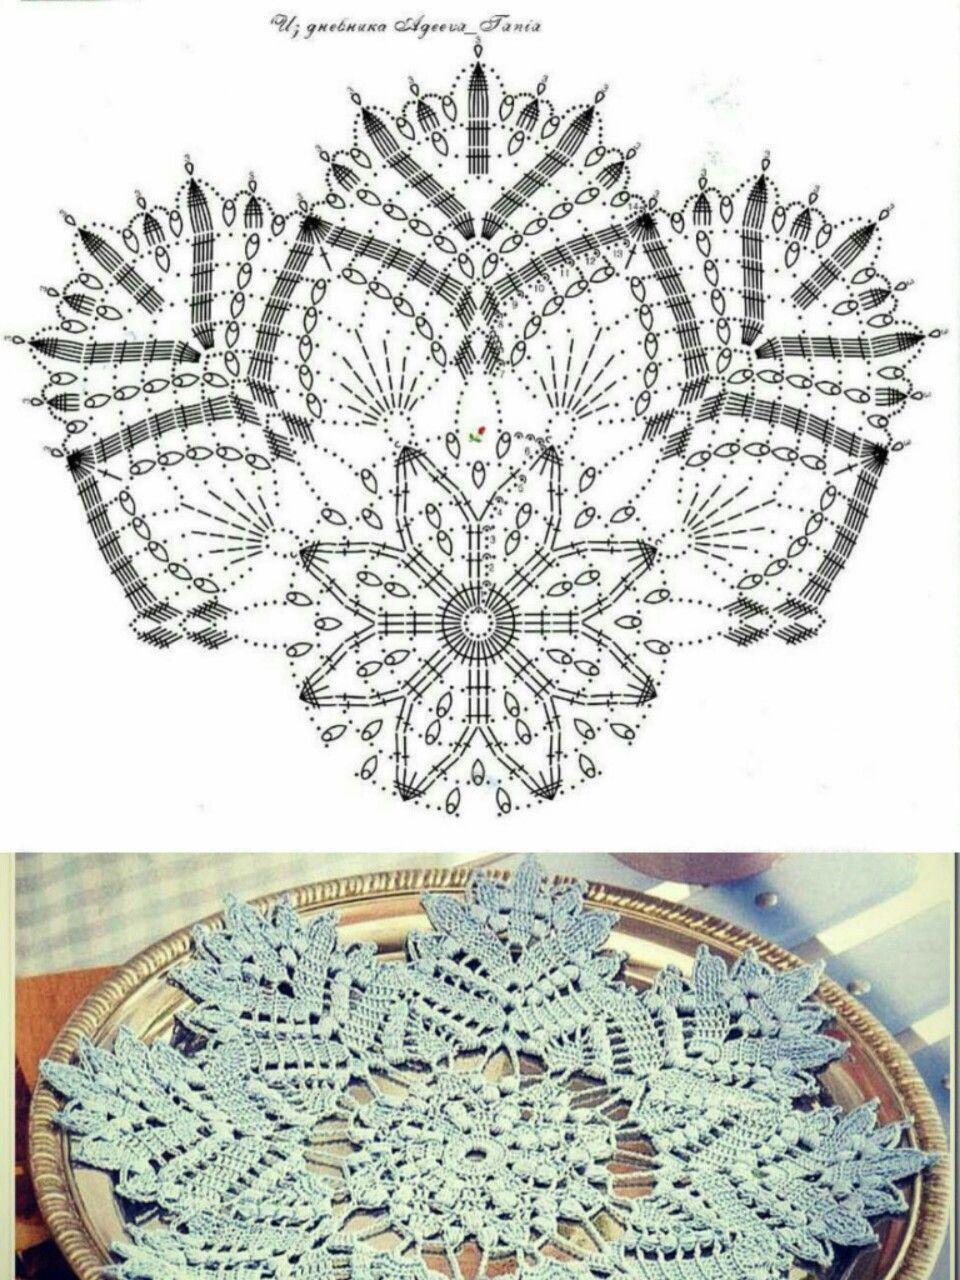 Pin de Eija Setänen en Virkkaus 1 - Crochet 1 | Pinterest